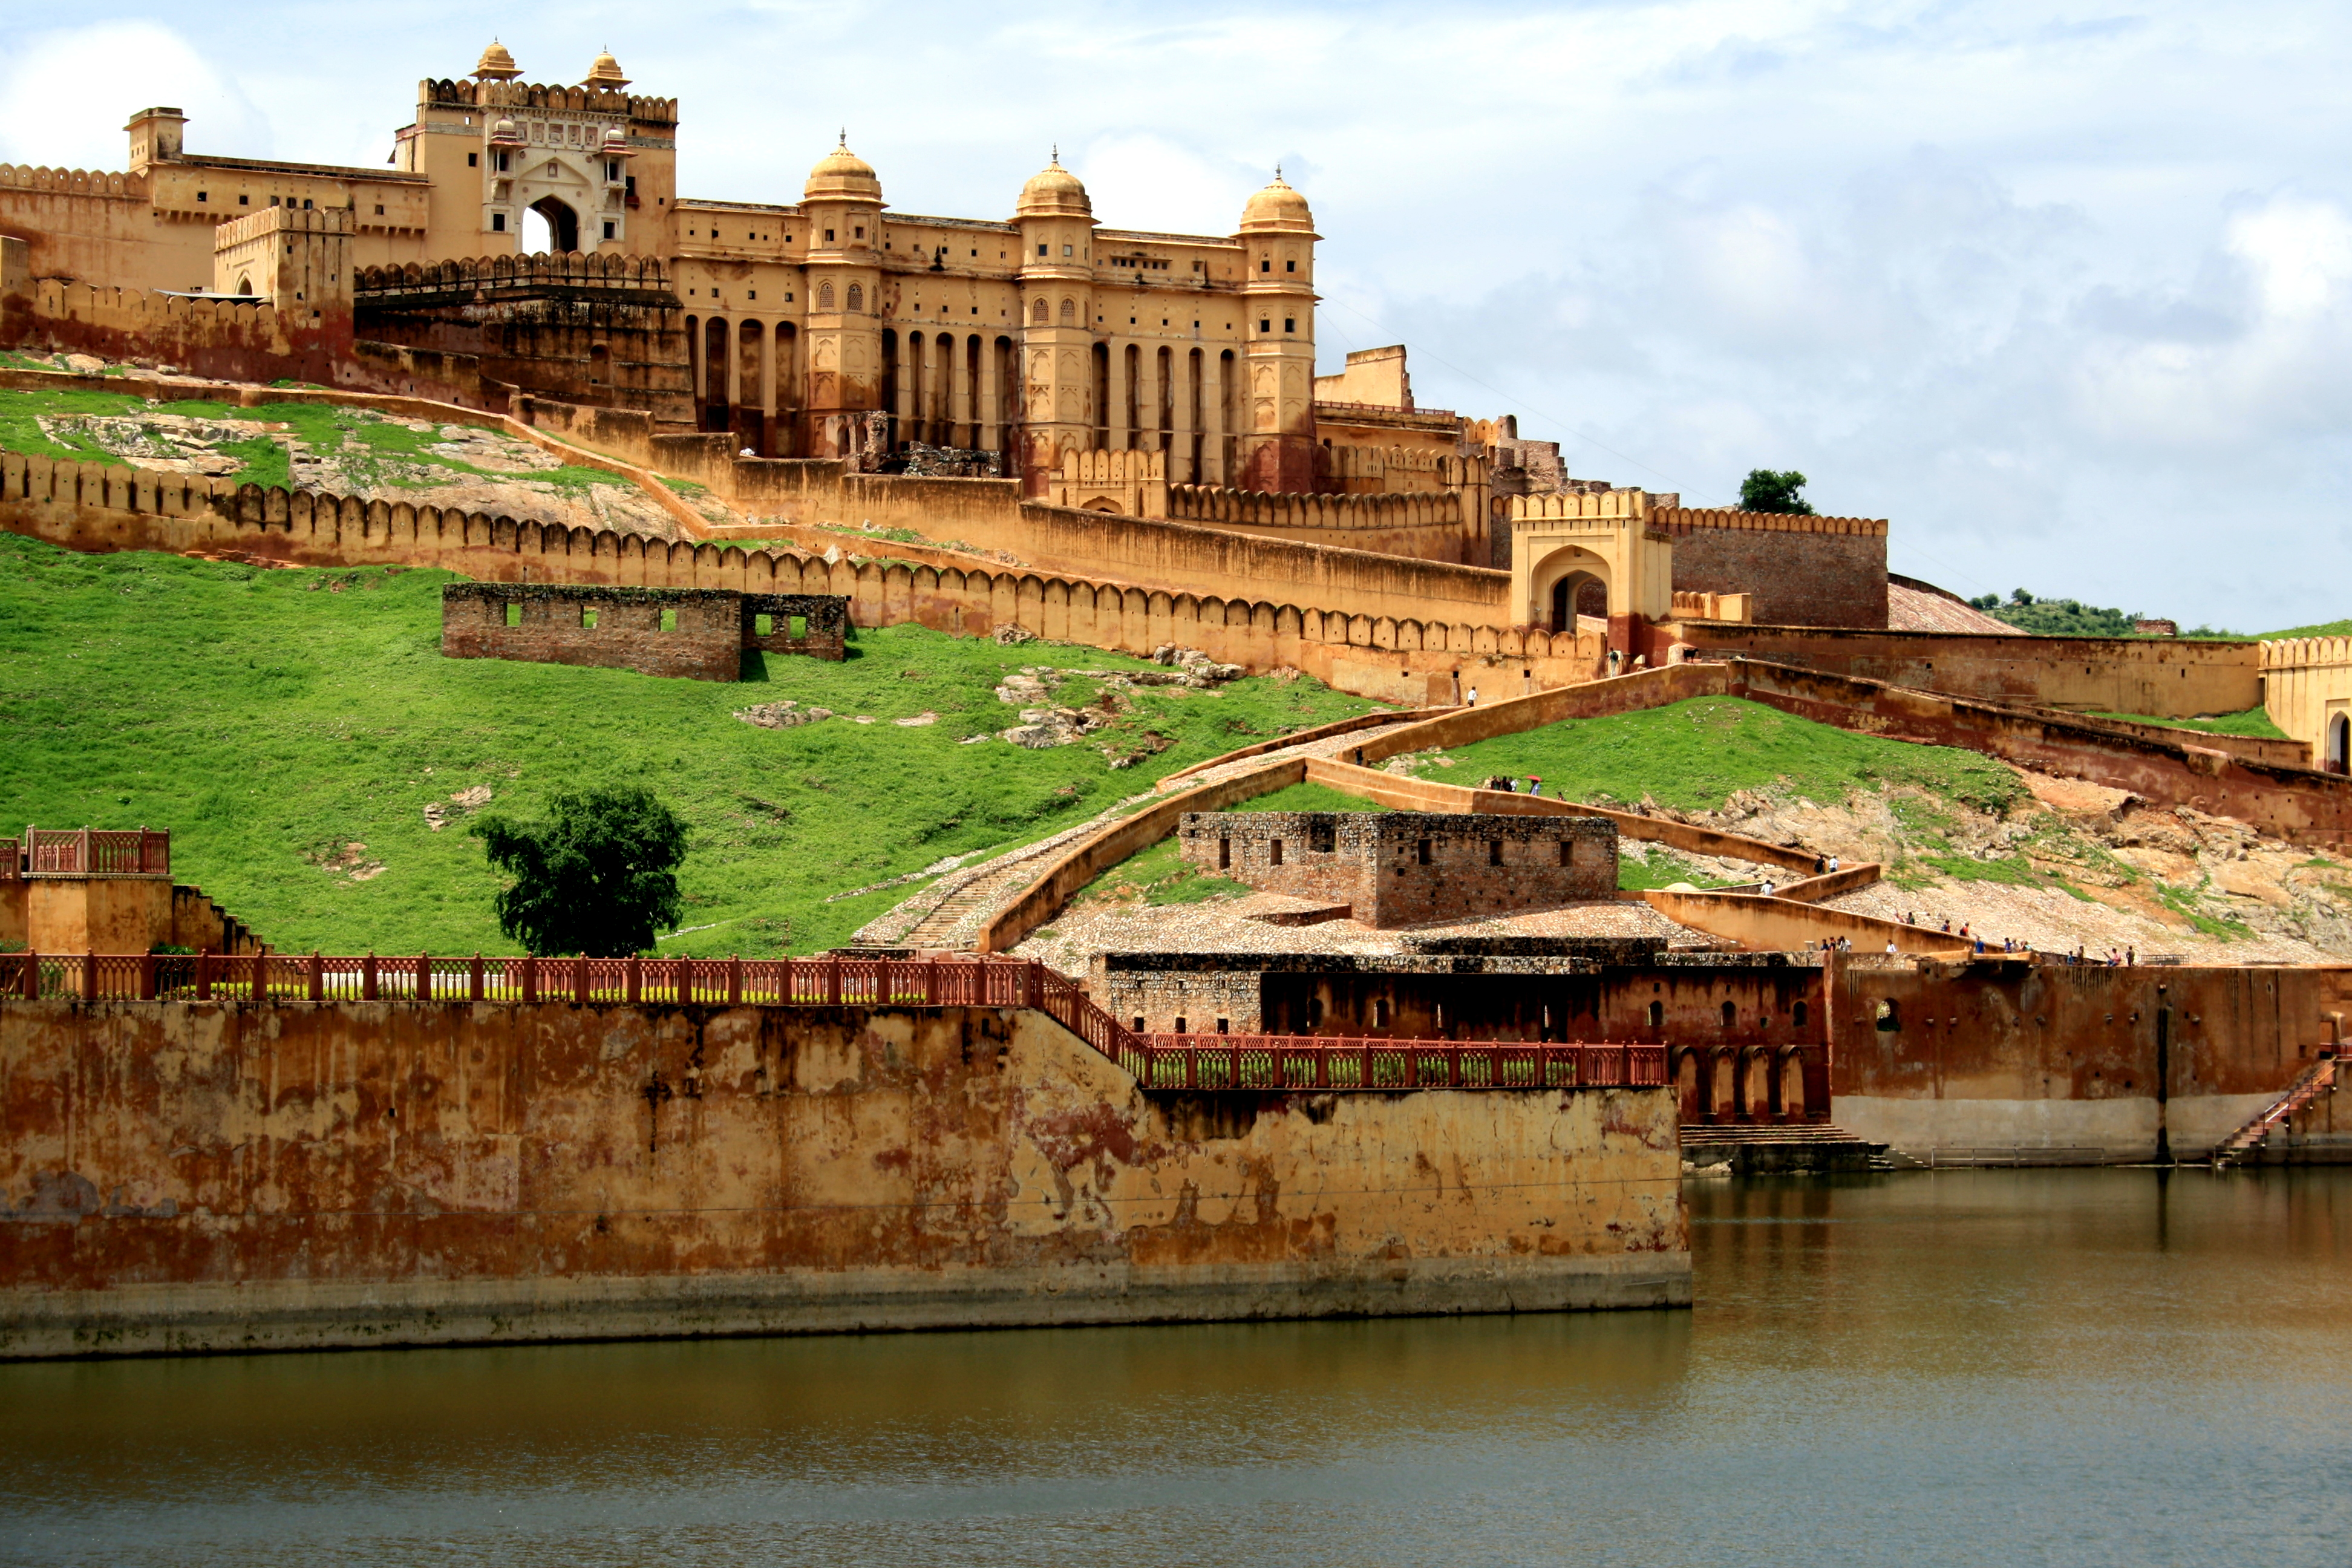 Jaipour castle i Rajasthan